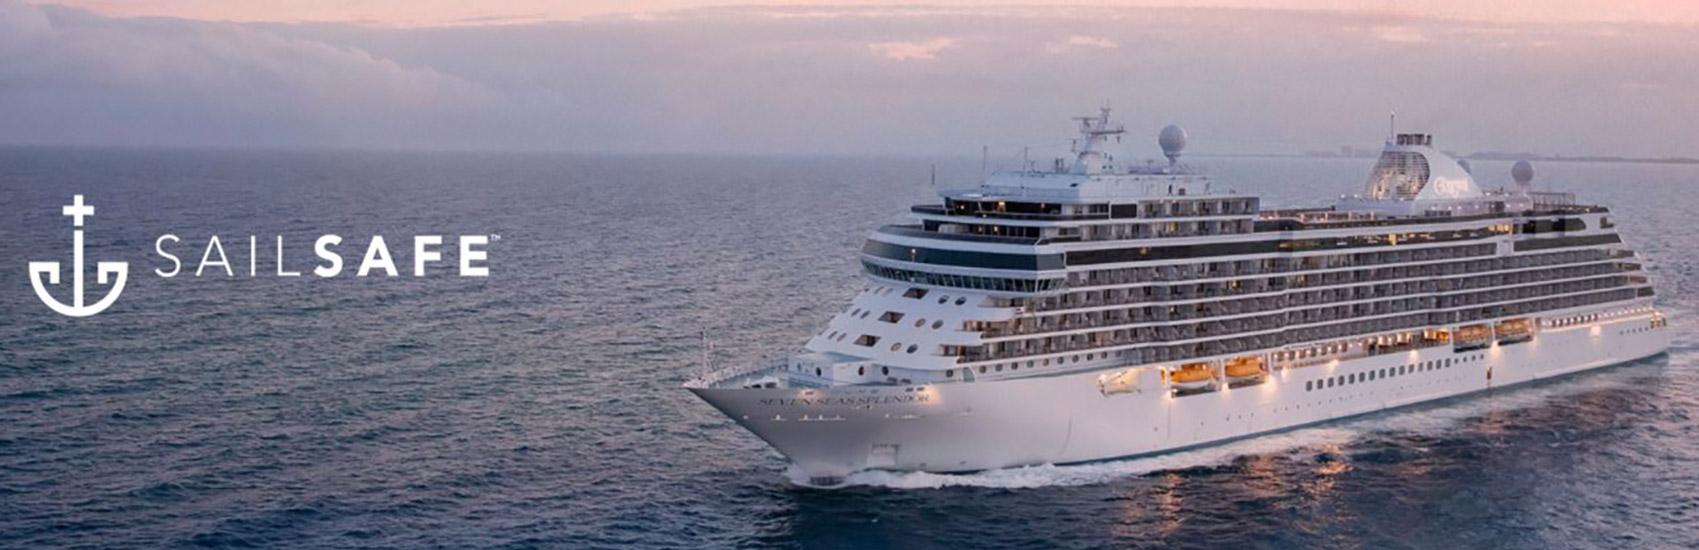 Regent Seven Seas Cruises Enhanced Health and Safety Protocols 0